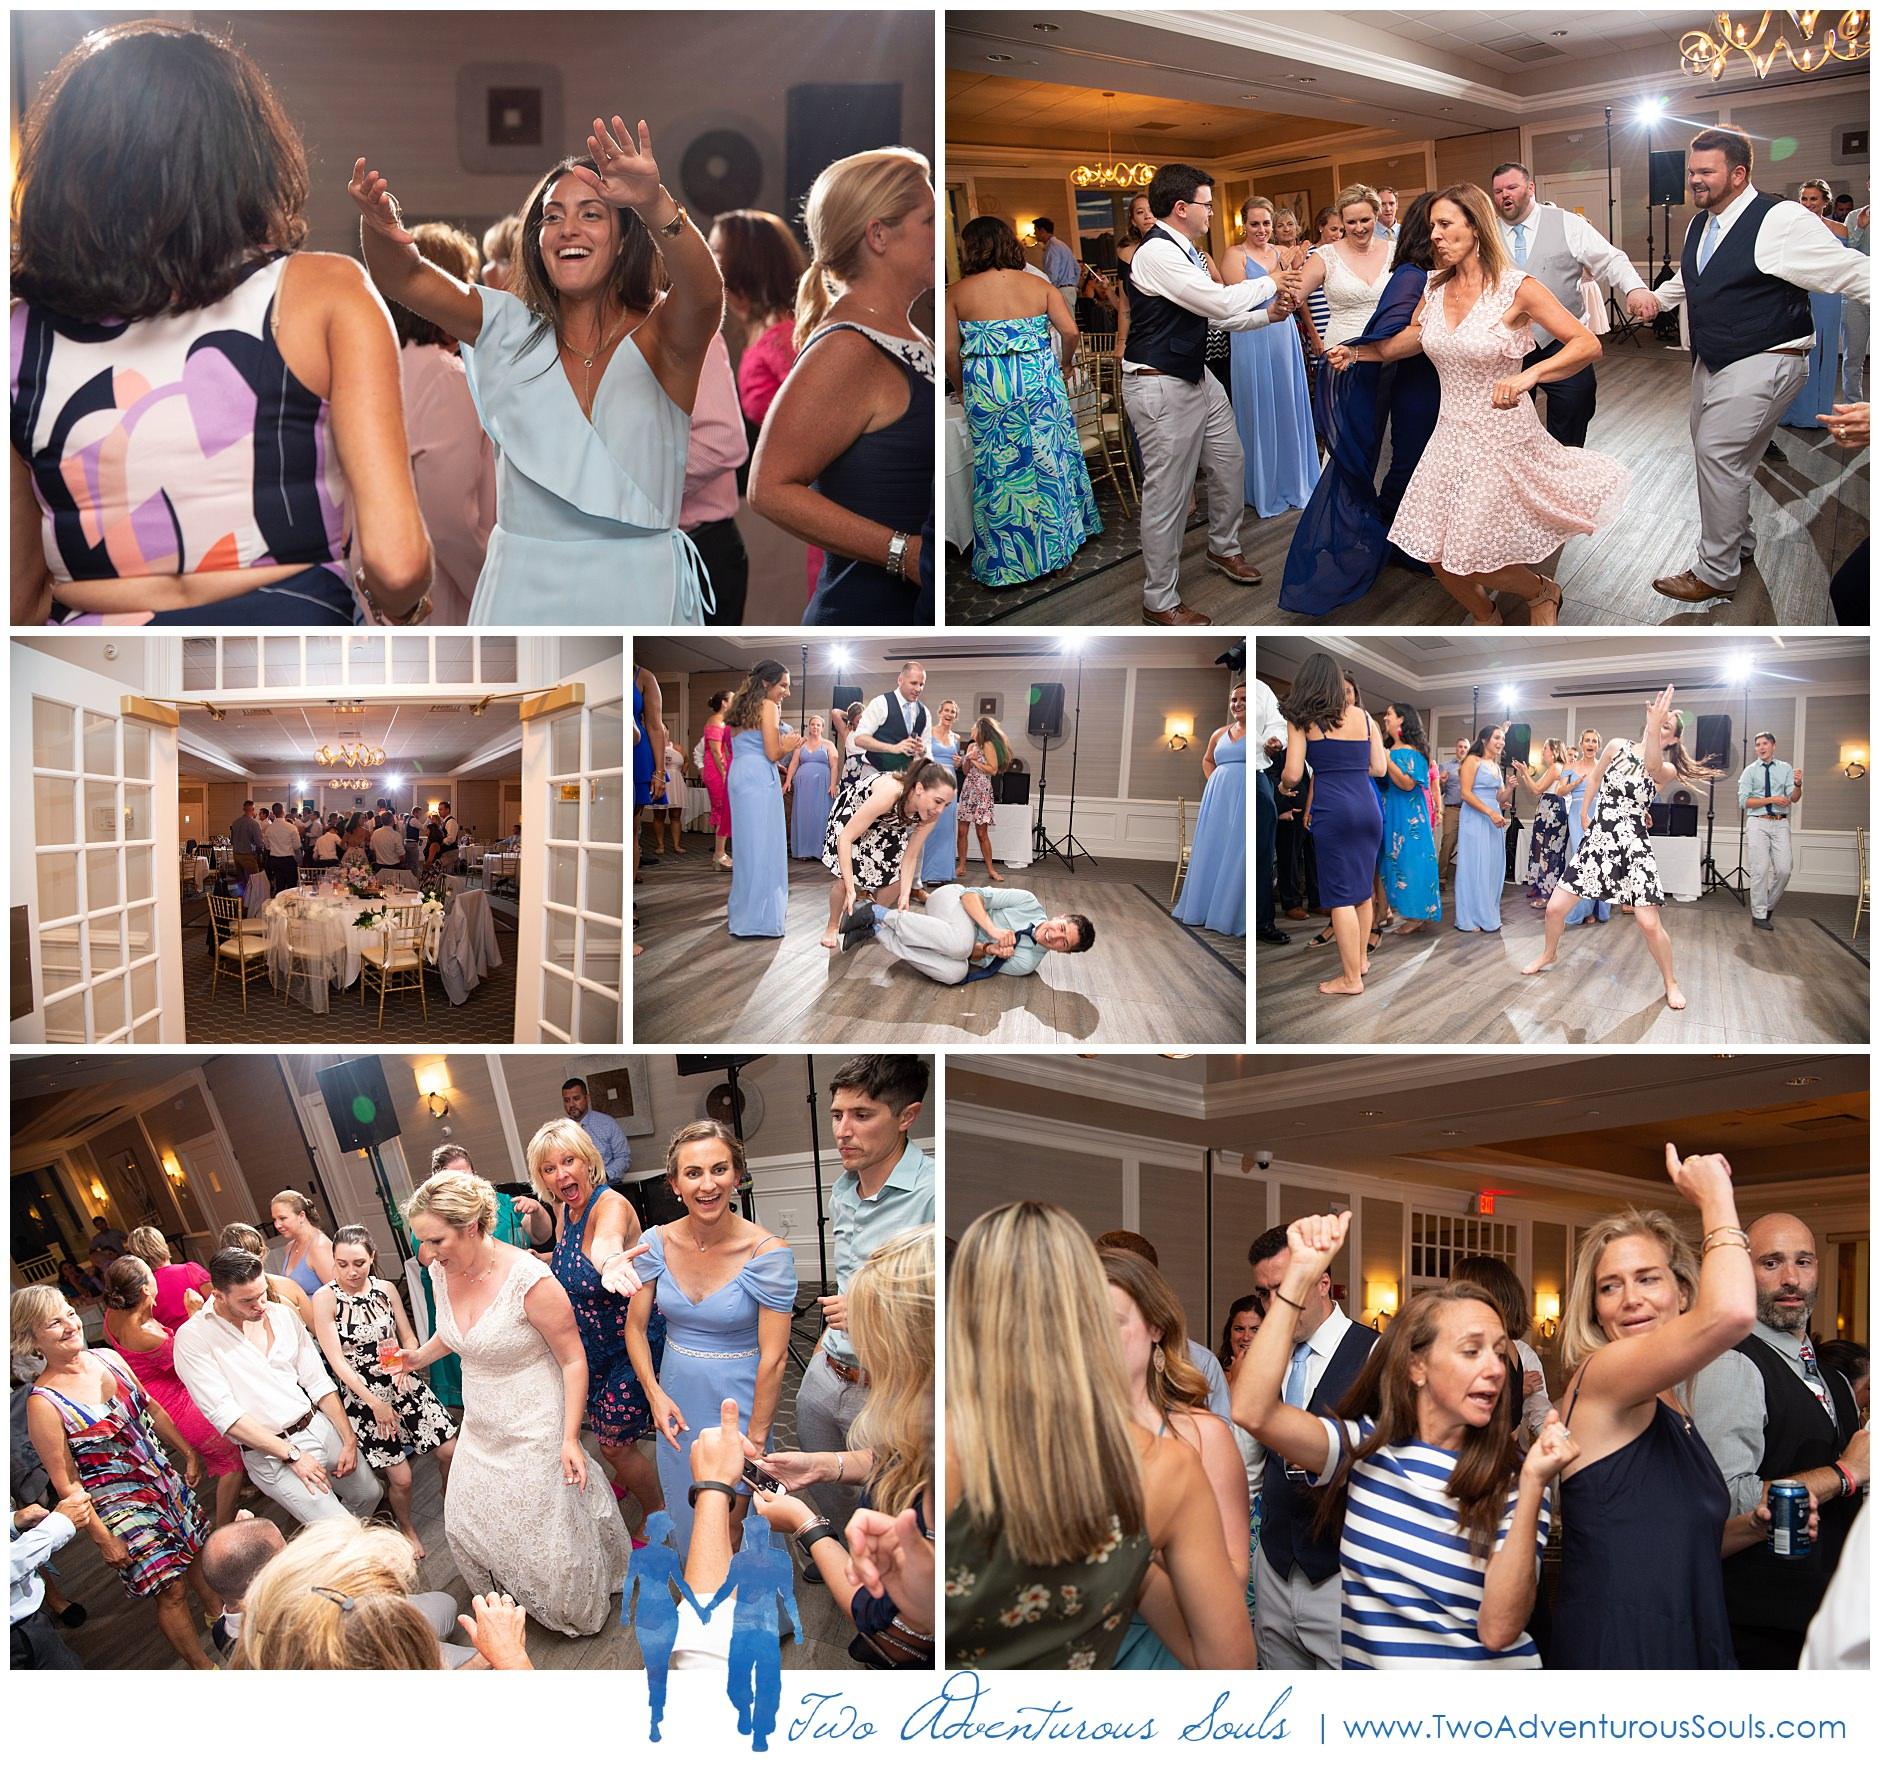 Cape Cod Wedding Photographers, Destination Wedding Photographers, Two Adventurous Souls-081019_0048.jpg